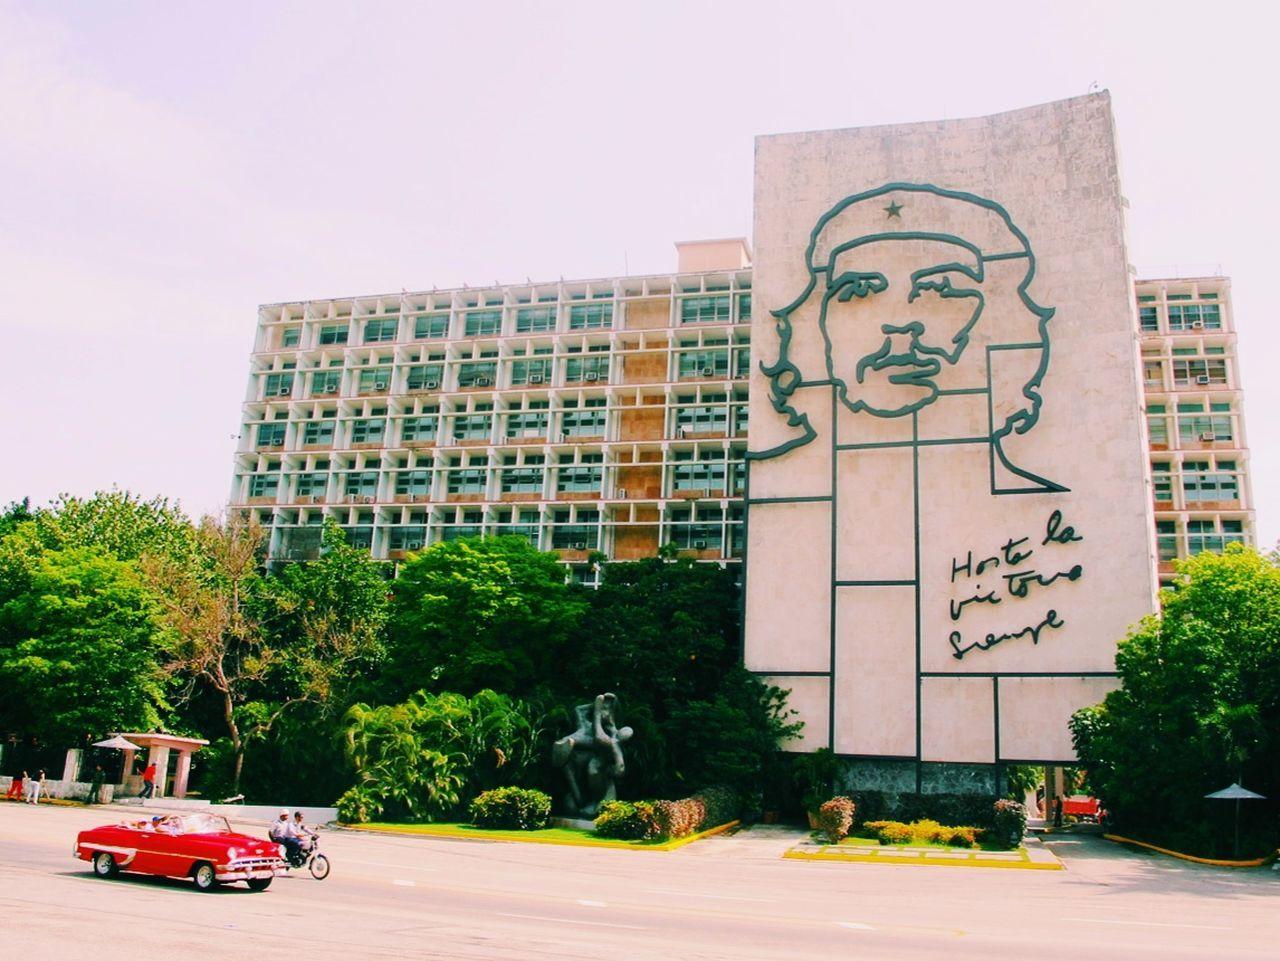 Original Experiences Cuba Cheguevara Travel Travel Photography Travel Destinations Showcase June Fine Art Photography